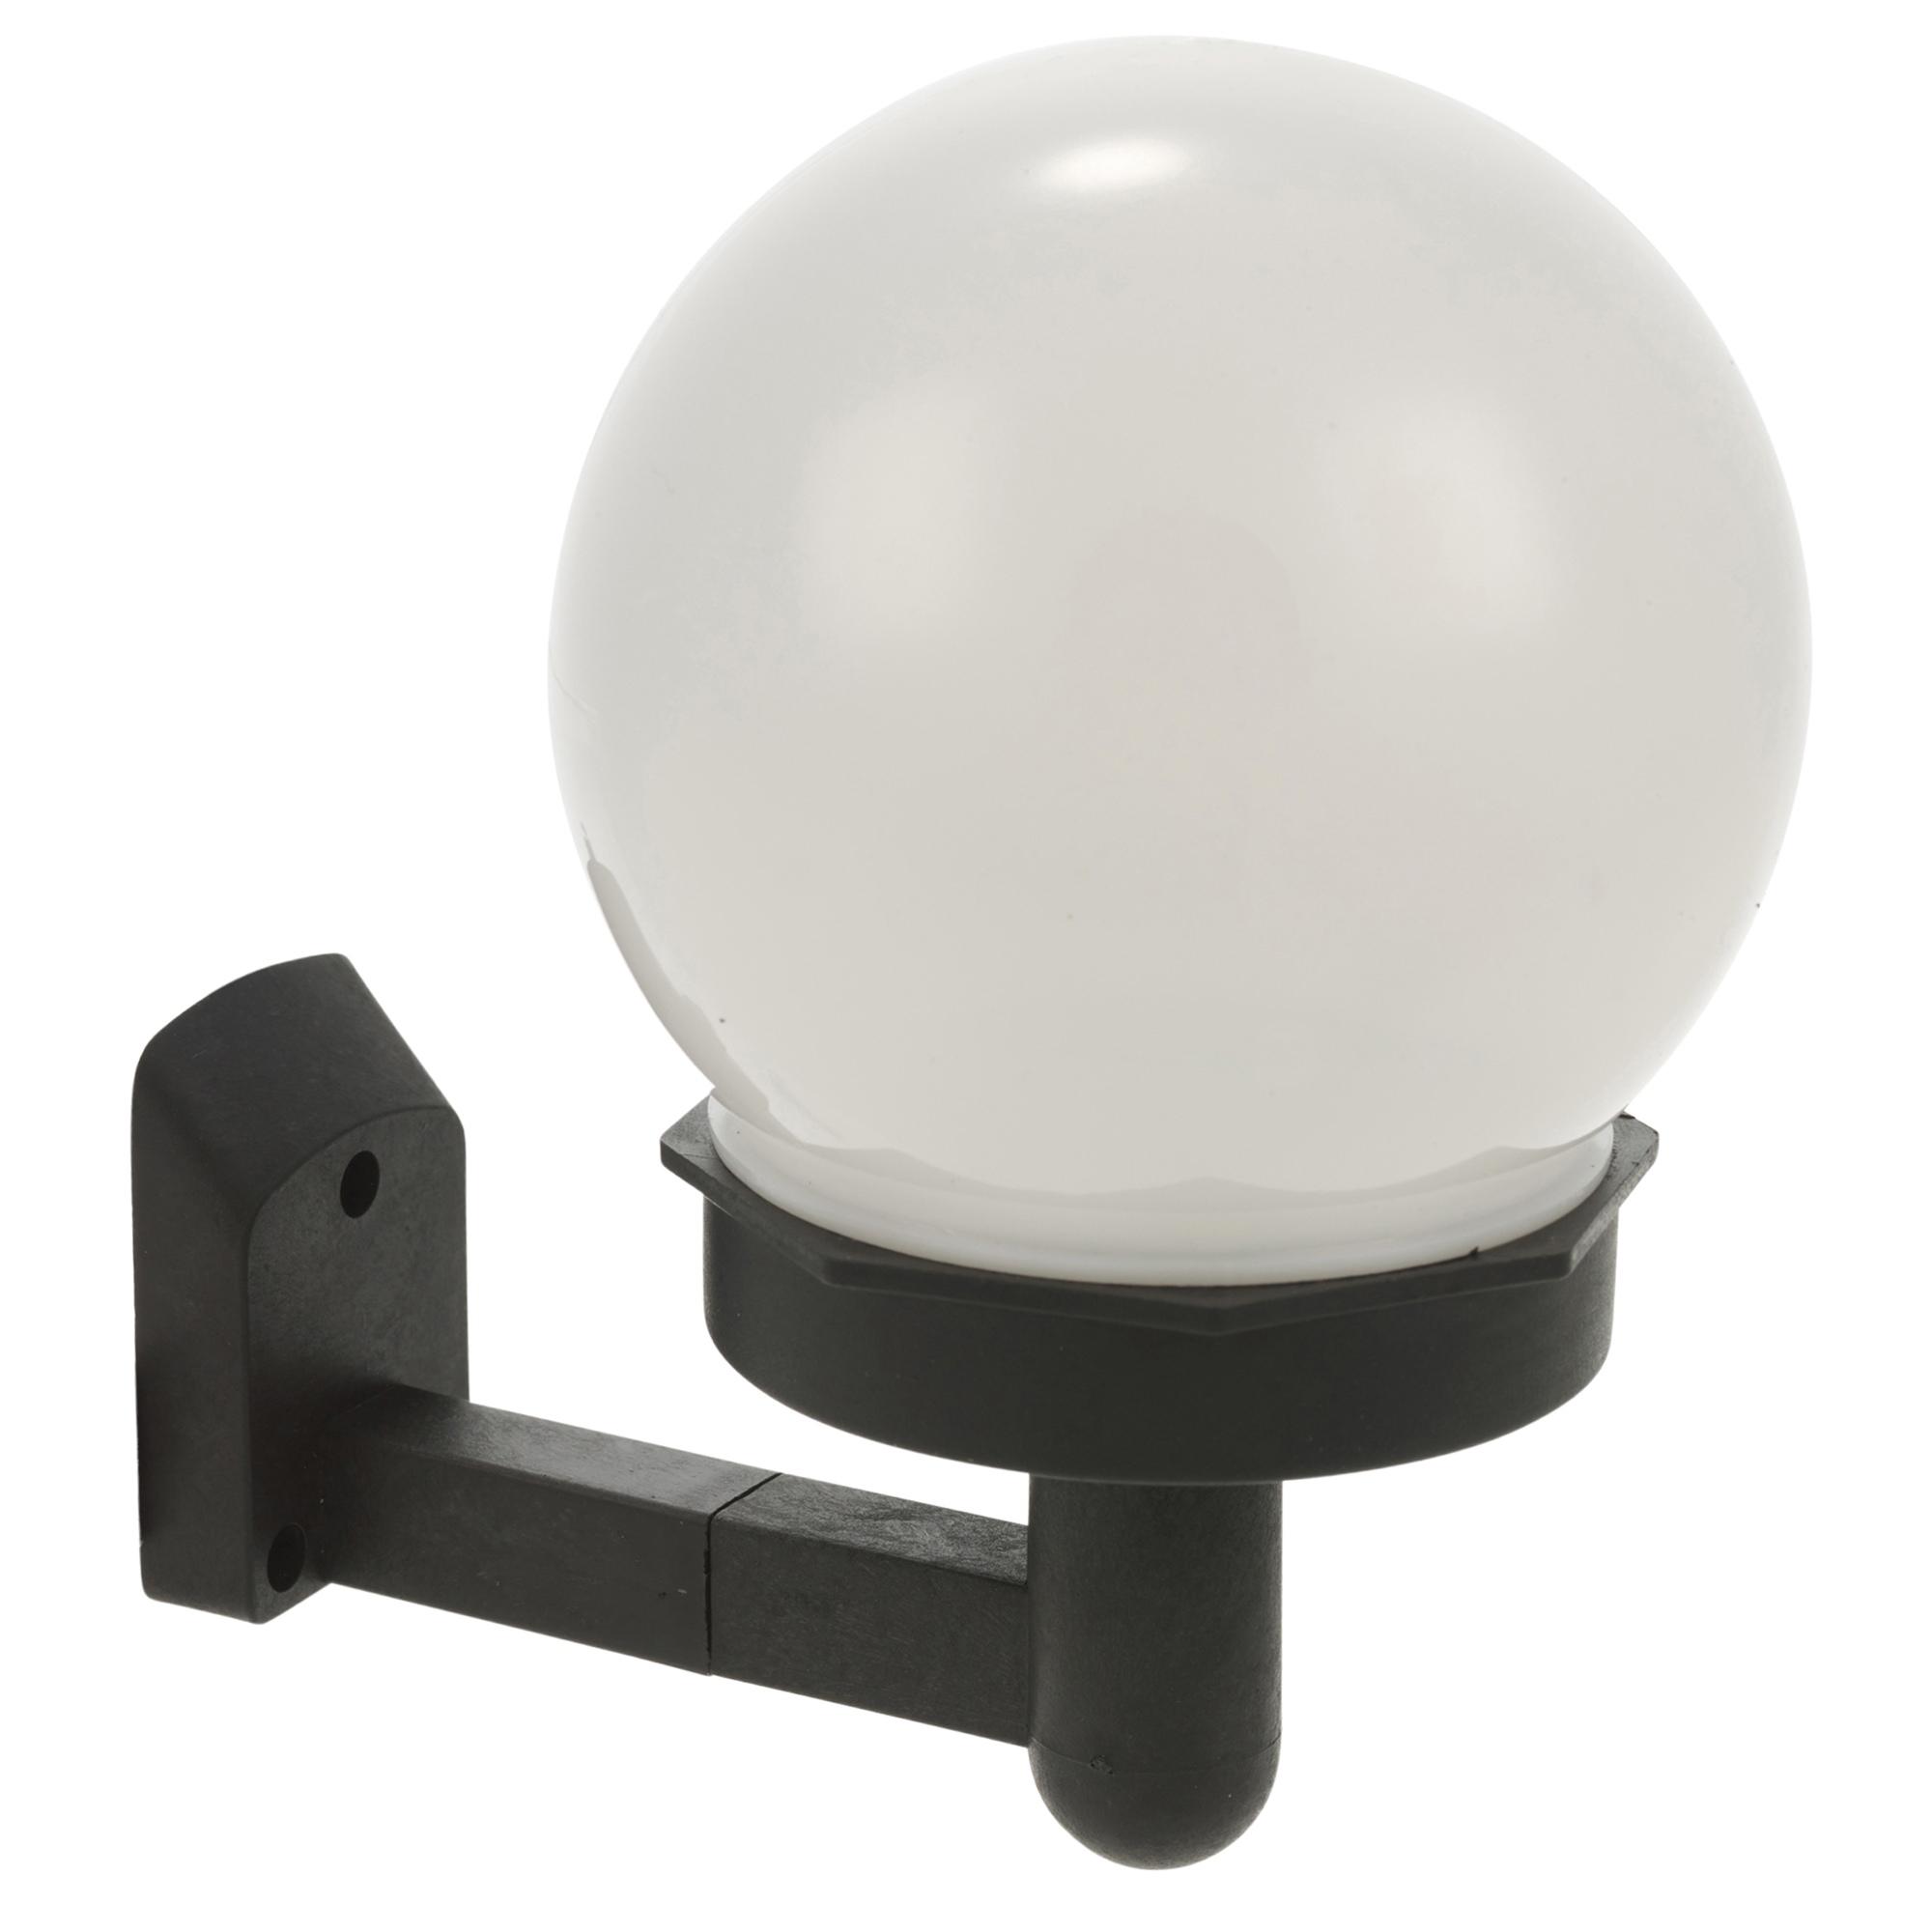 goodlands-round-white-globe-wall-light X Light Switch Wiring on x10 sensor switch, x10 wiring diagram, x10 dimmer switch,